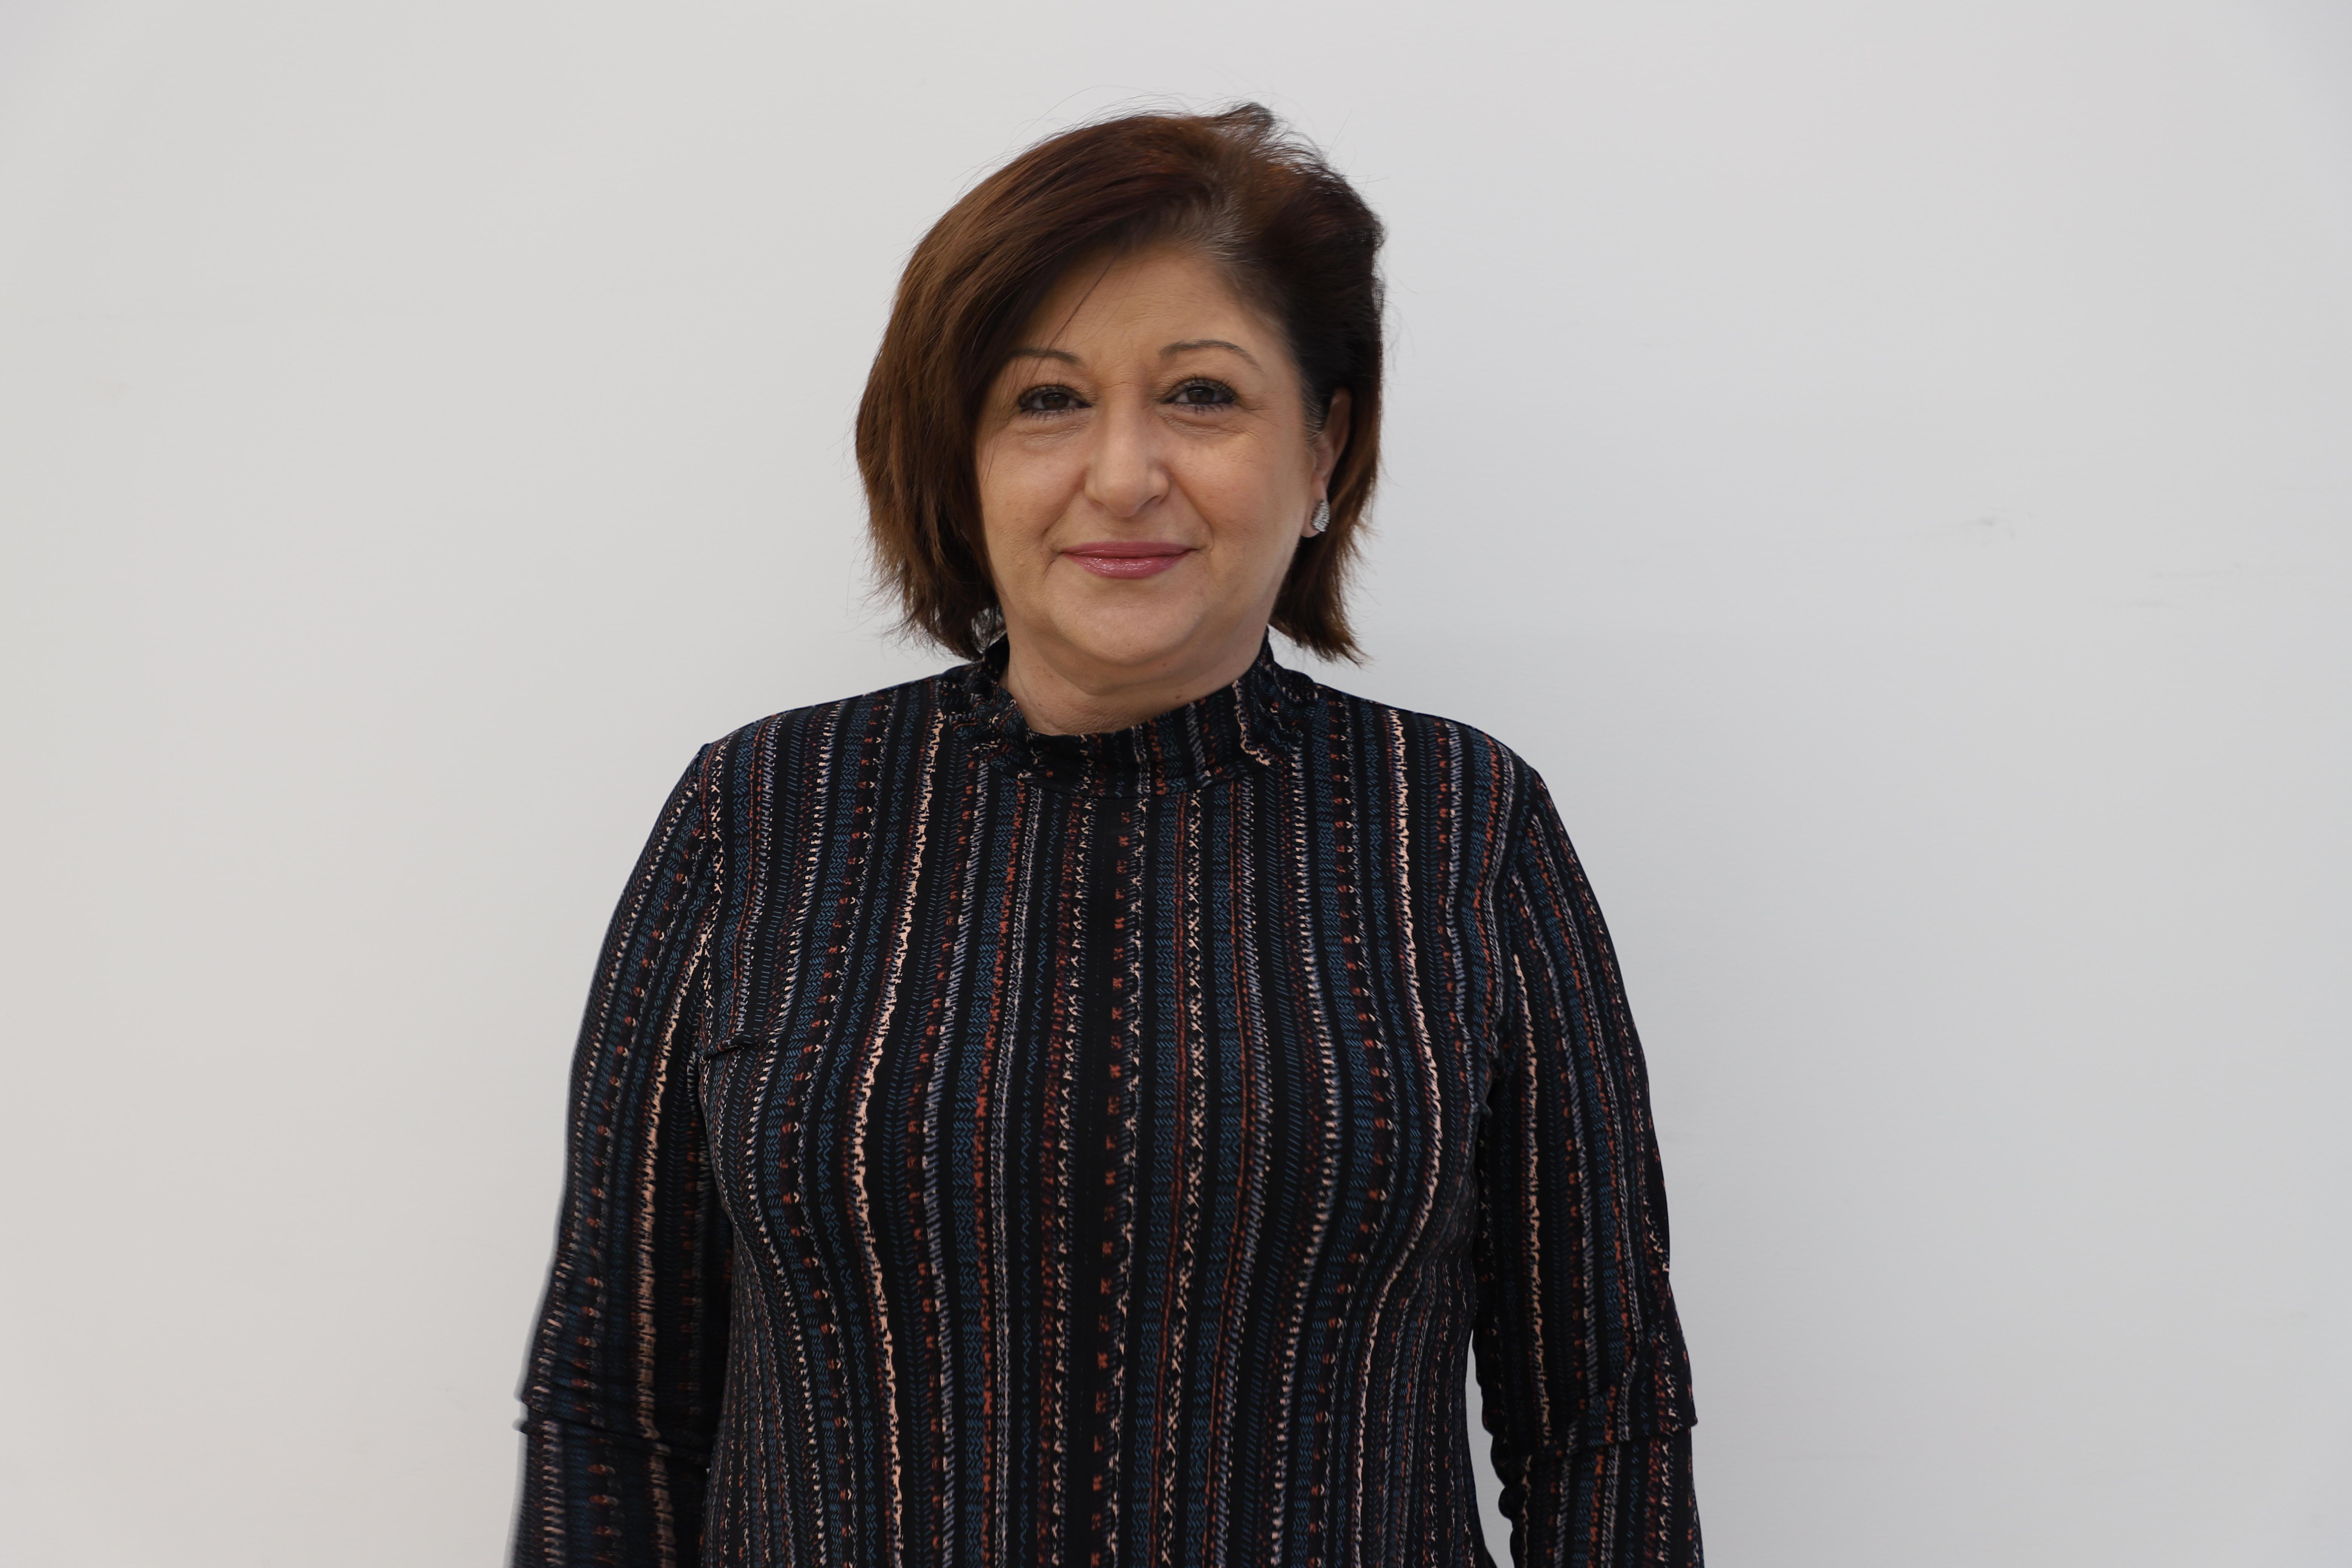 Anna Guida - Accounts Payable